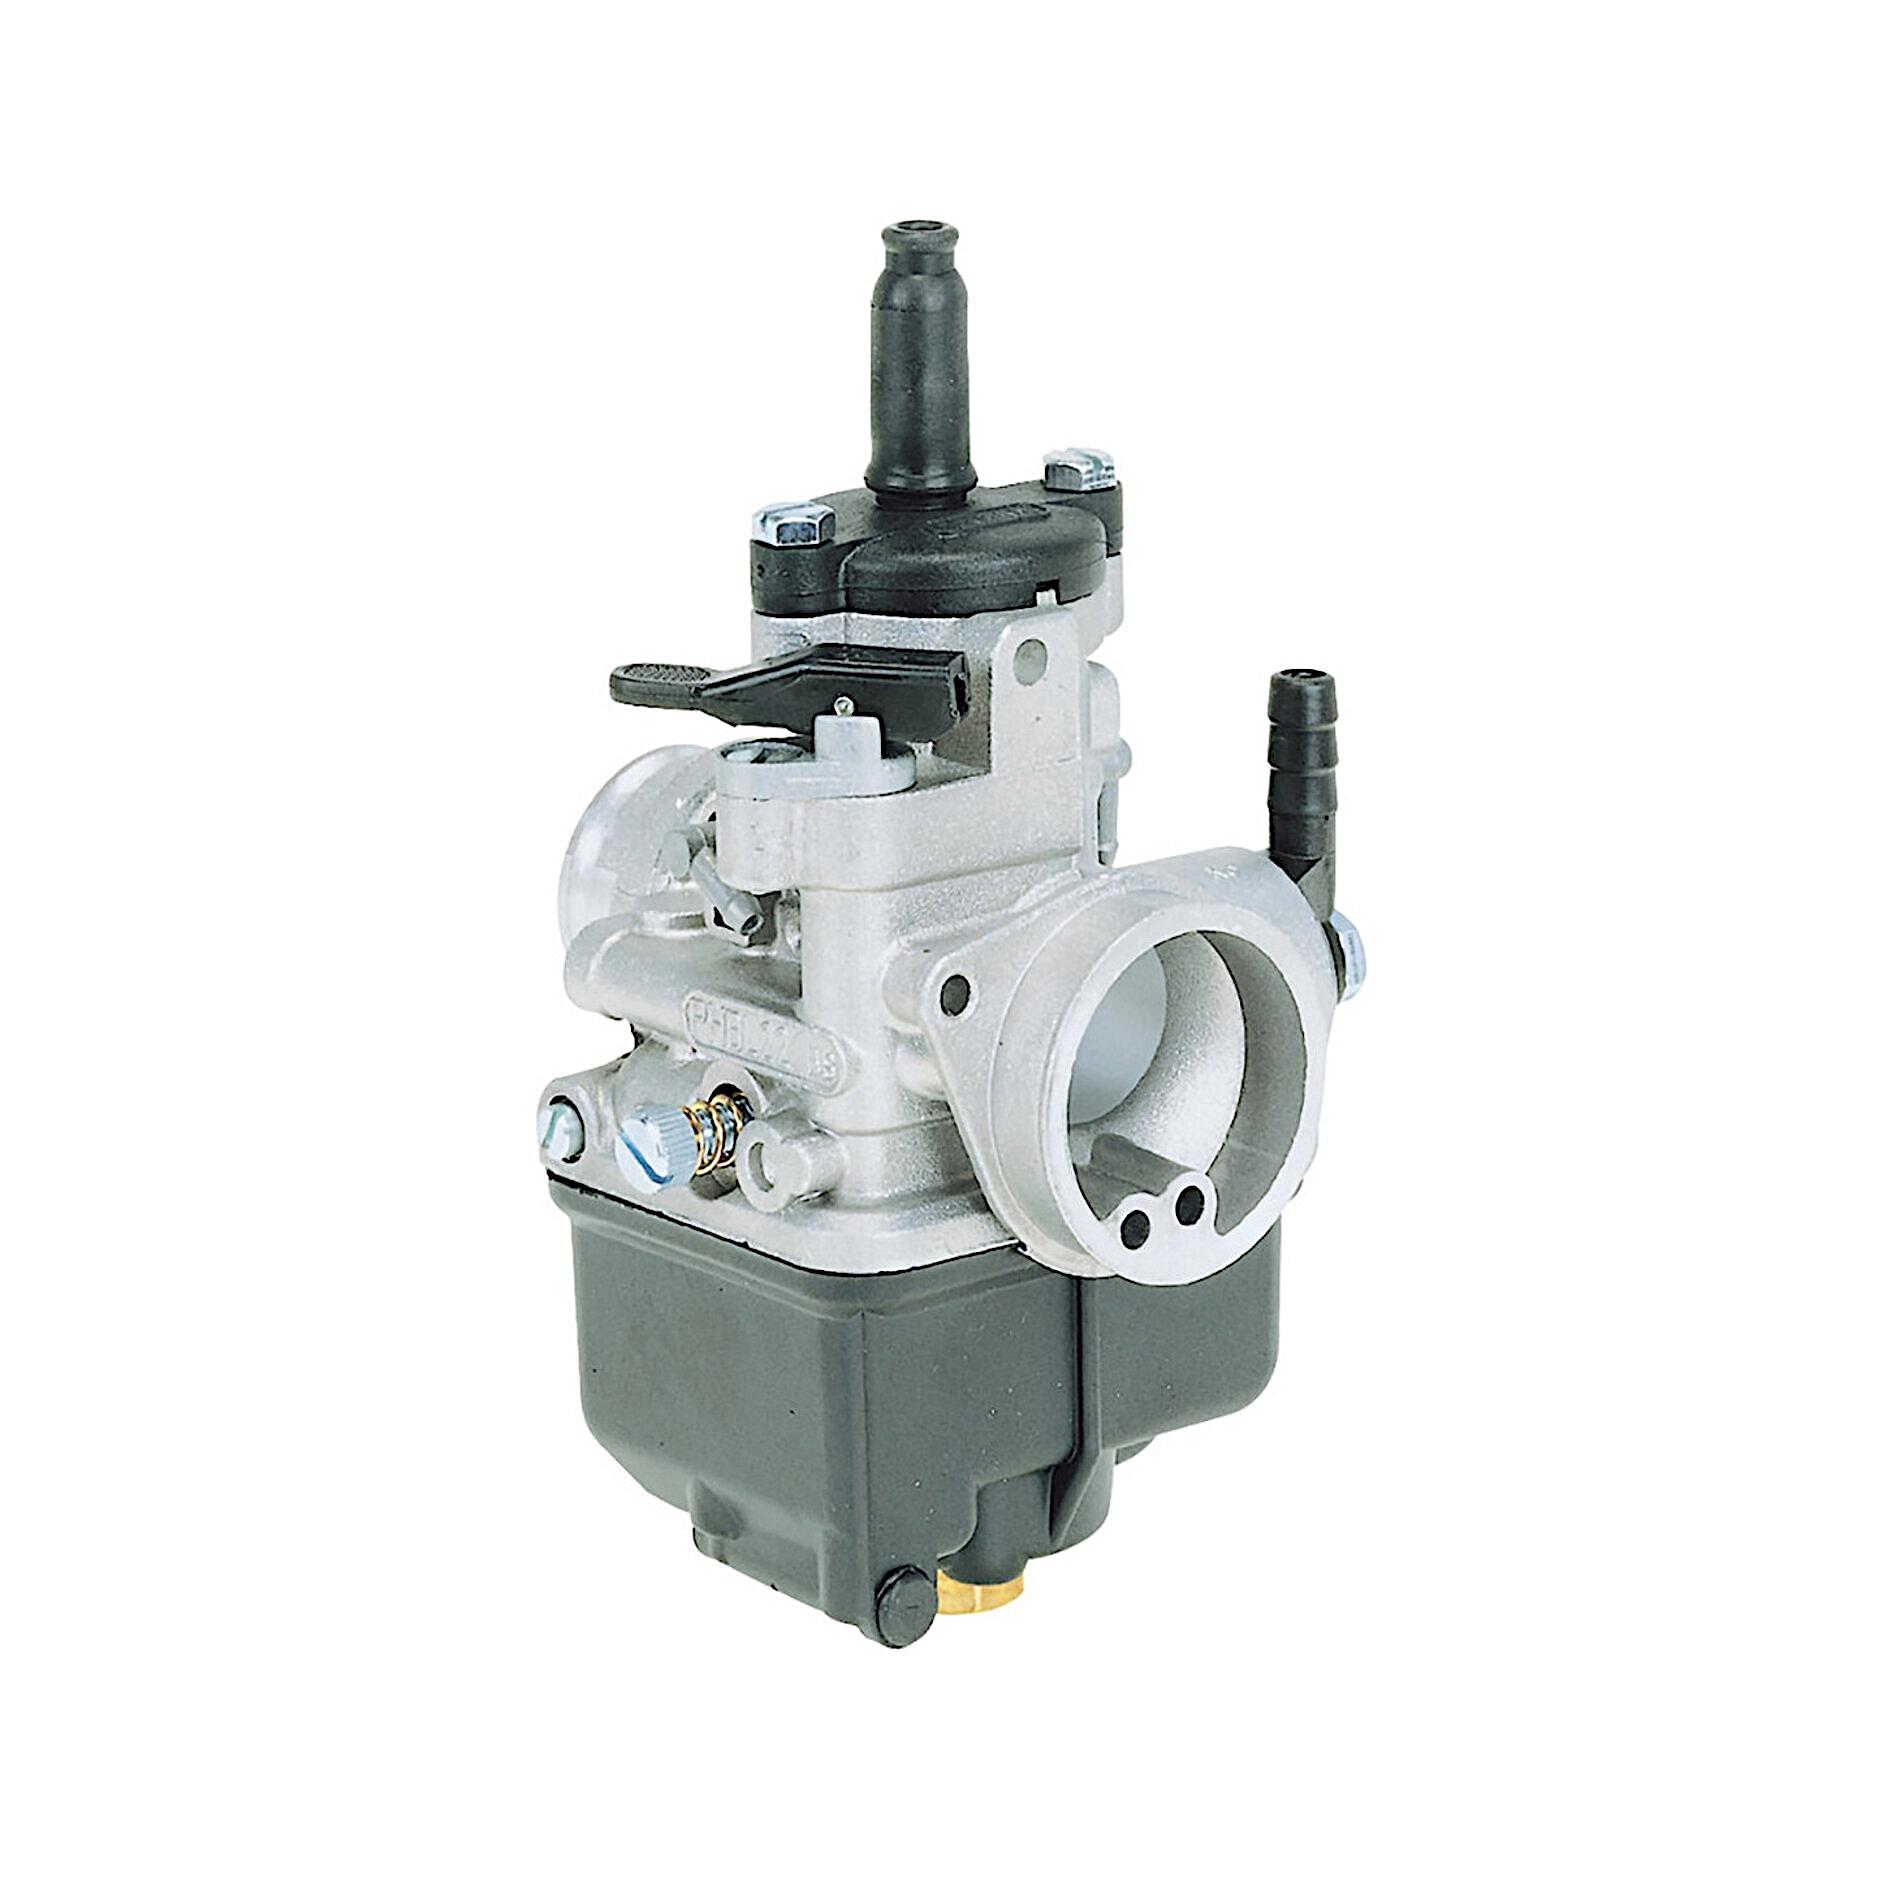 Carburateur Malossi 2841 PHBL 26 BS